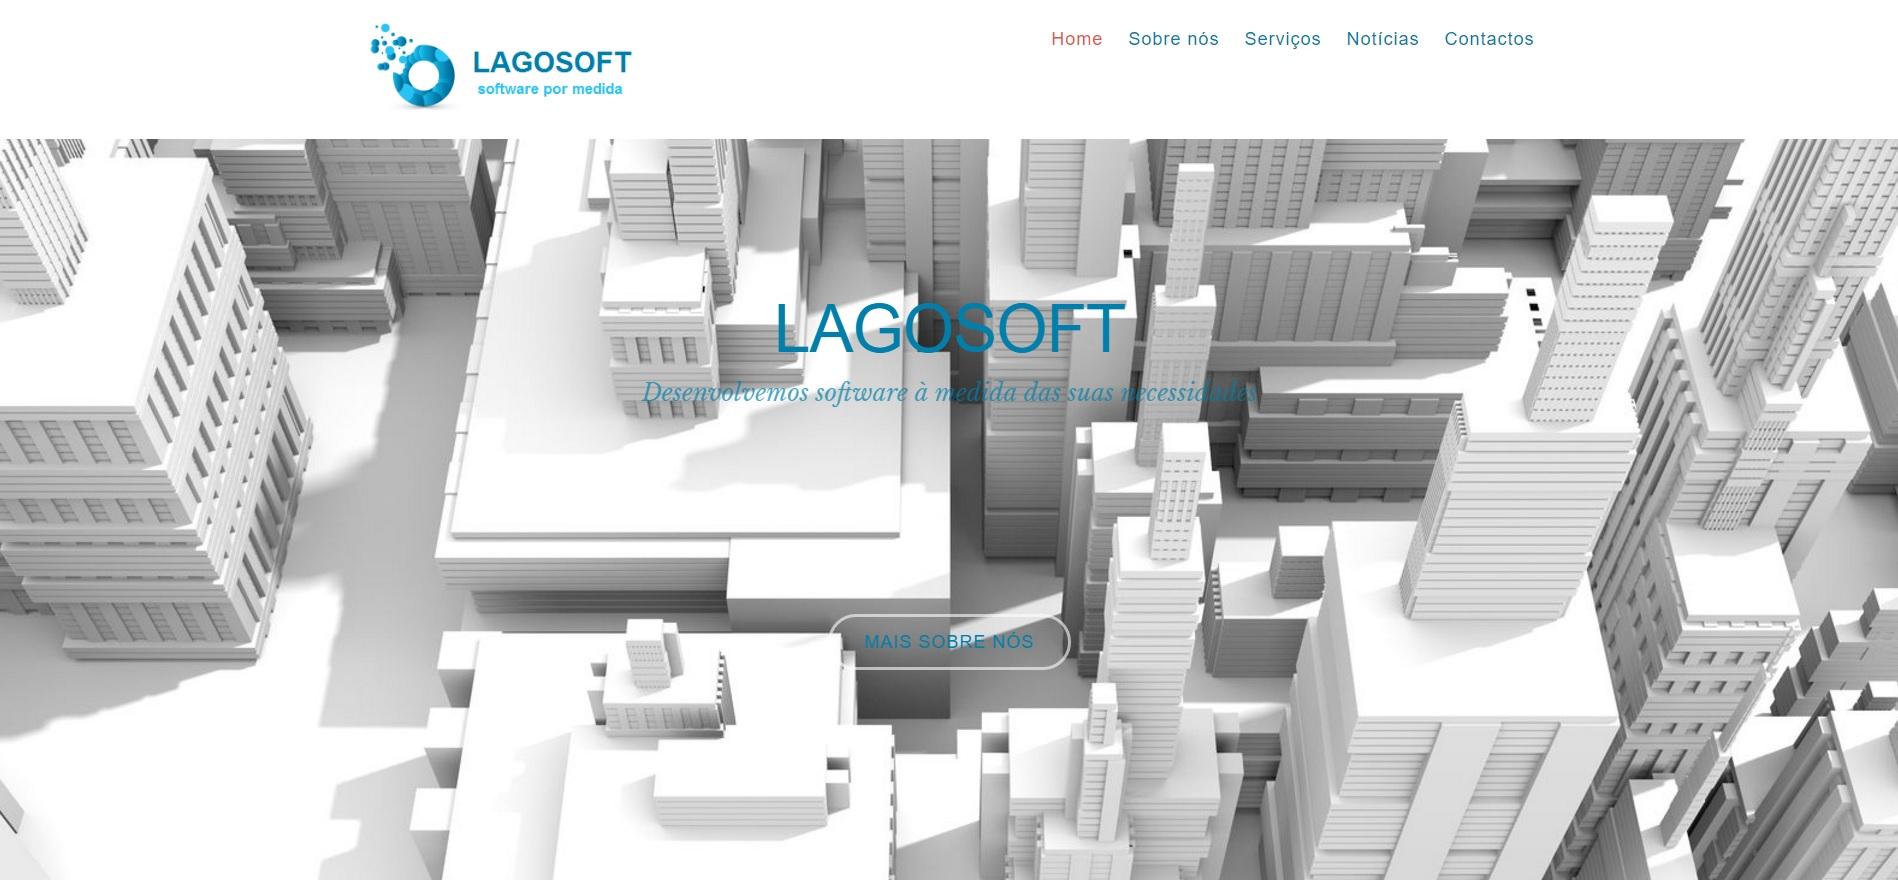 lagosoft1898x880